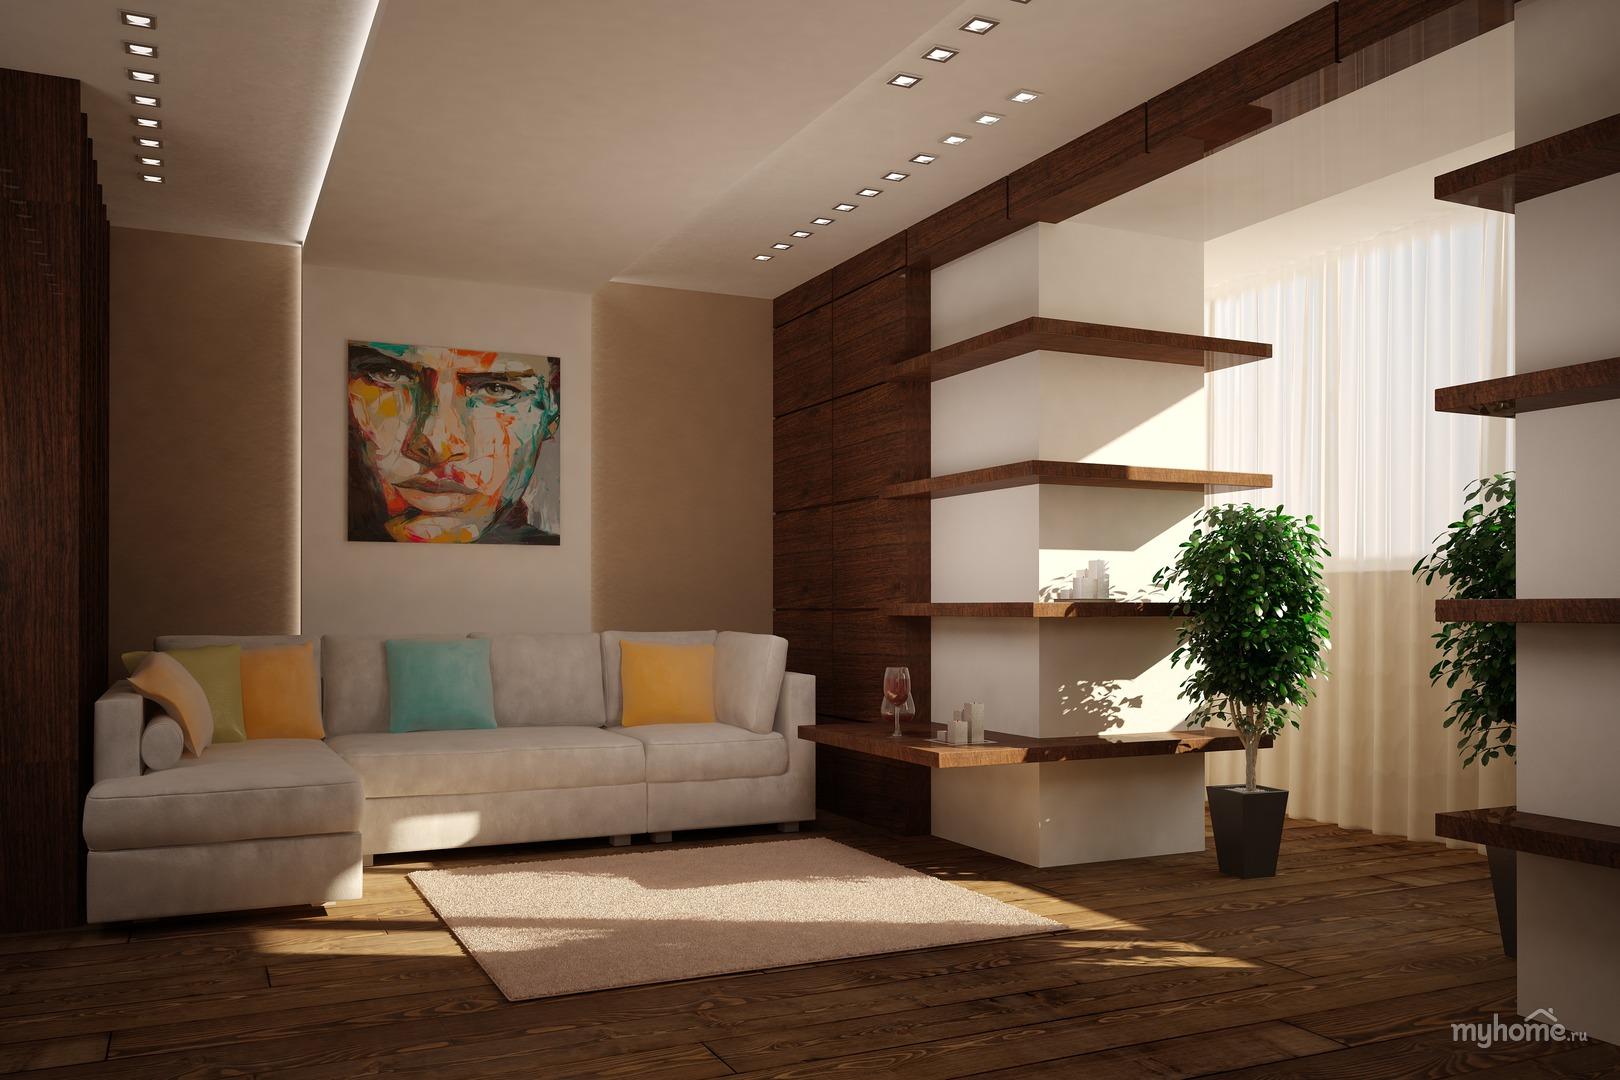 Гостиная, цвет белый в стиле минимализм - фото и дизайн на v.